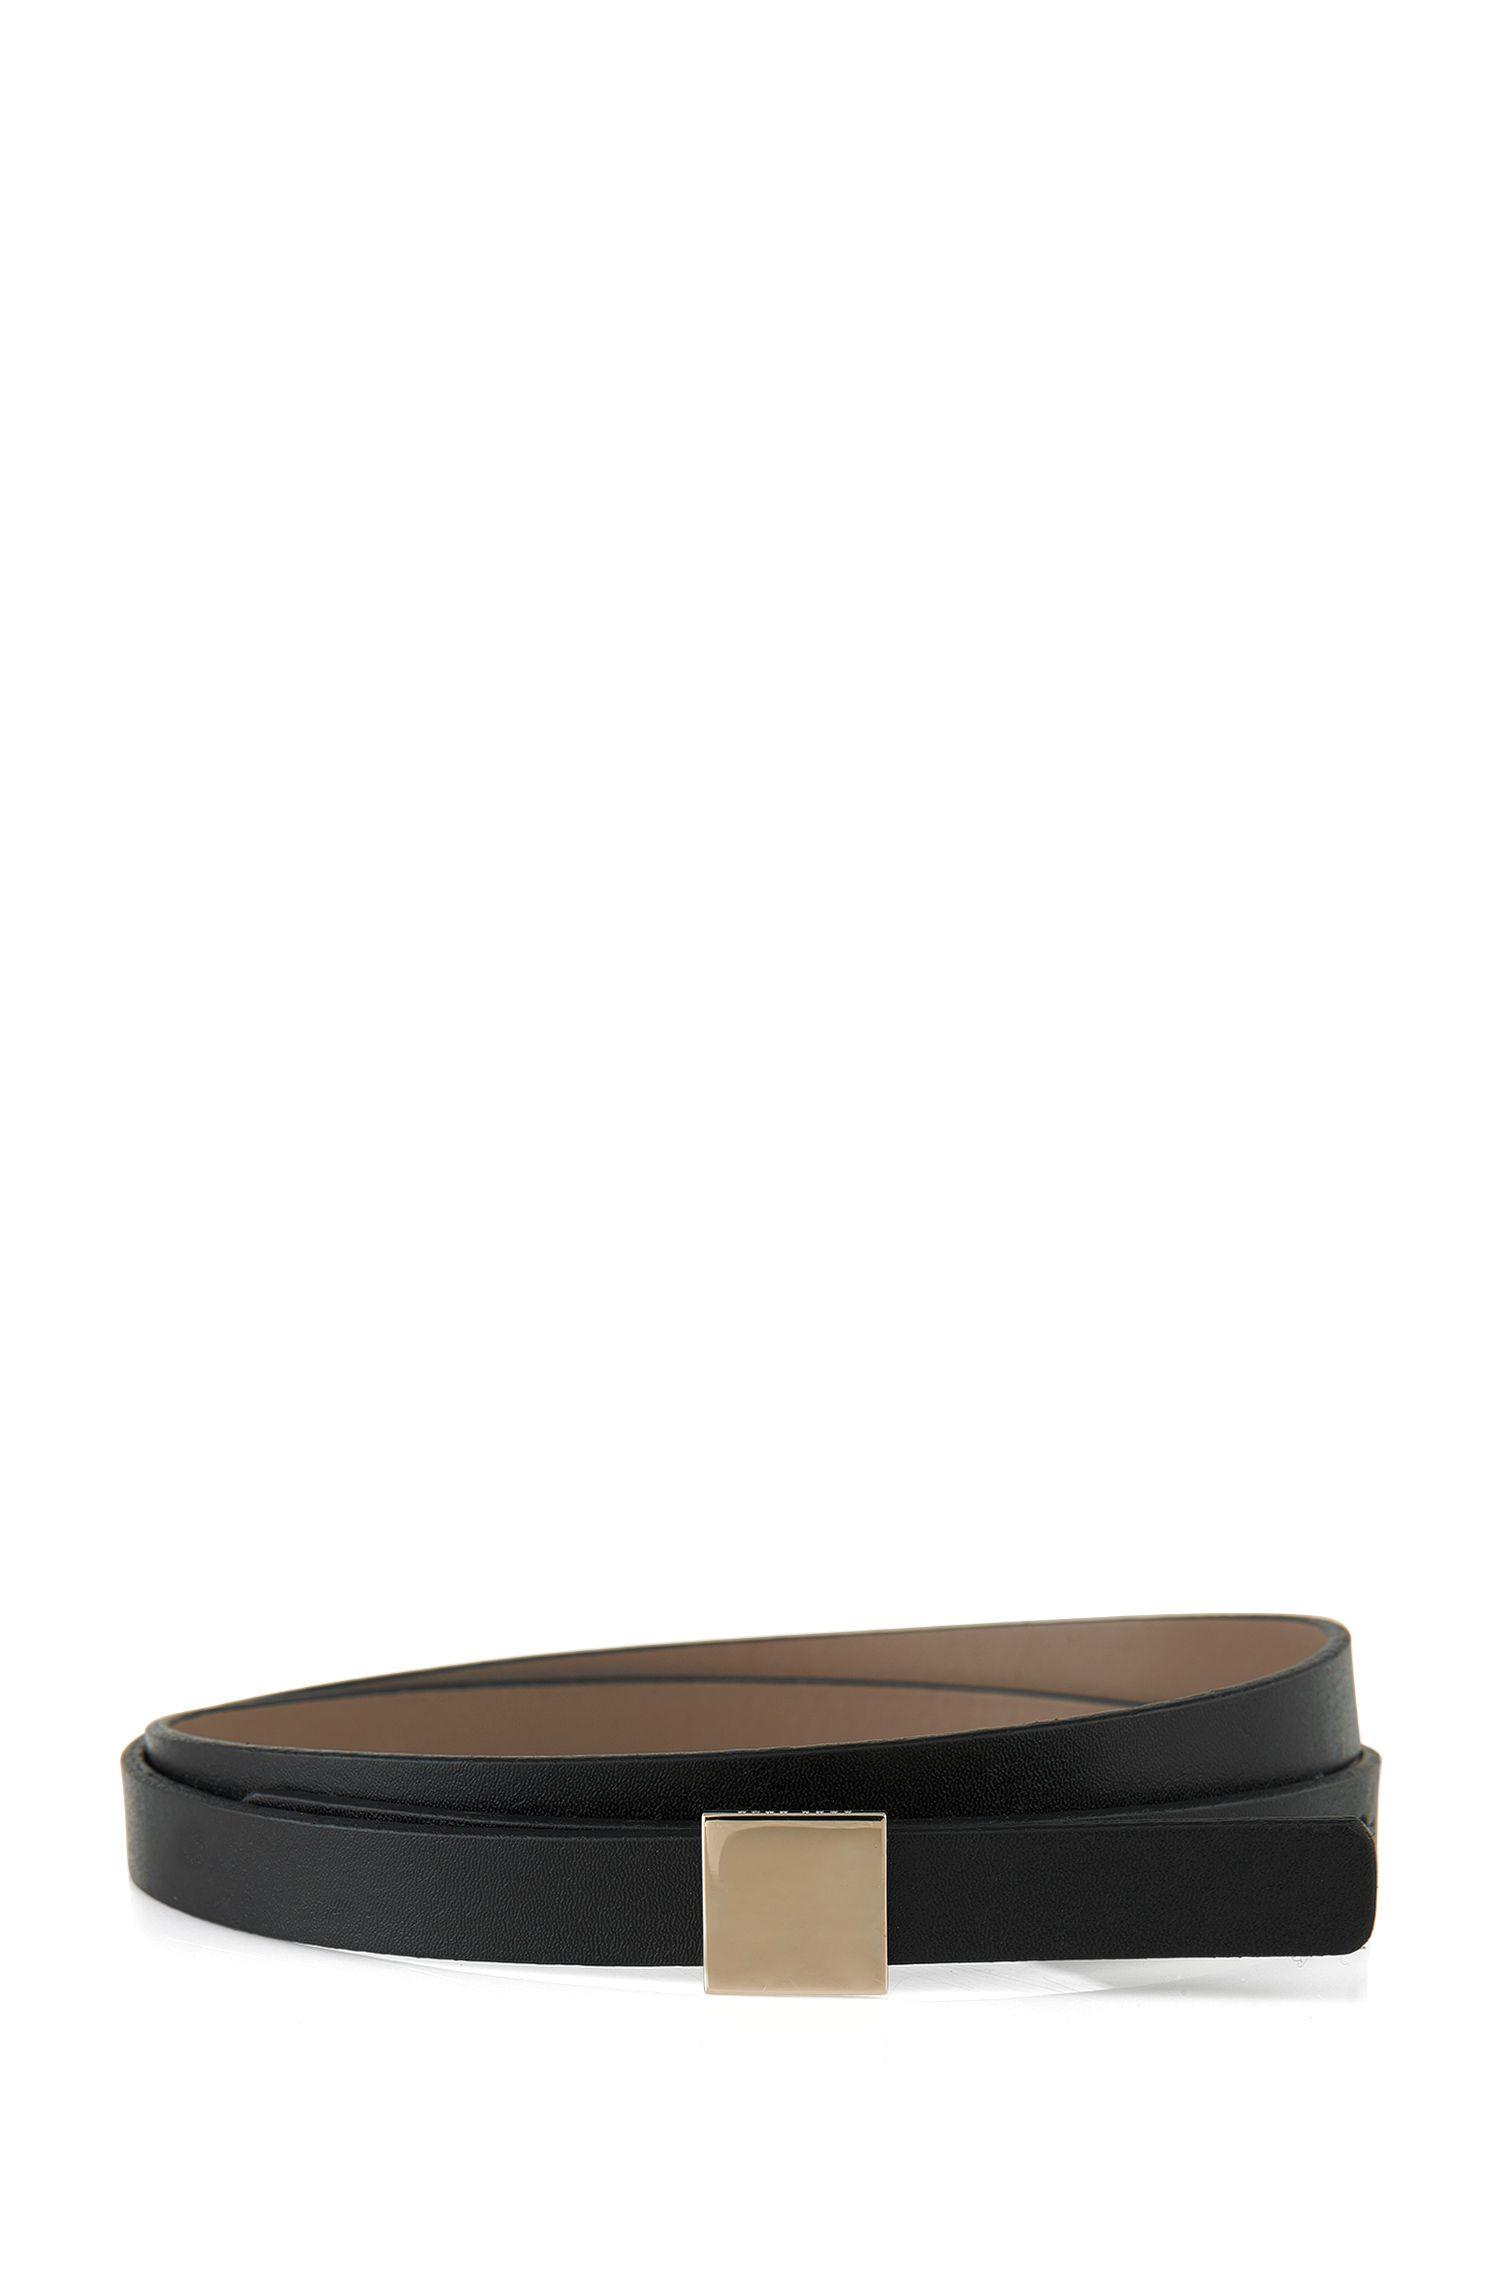 'Bliss' | Leather Reversible Plaque Skinny Belt